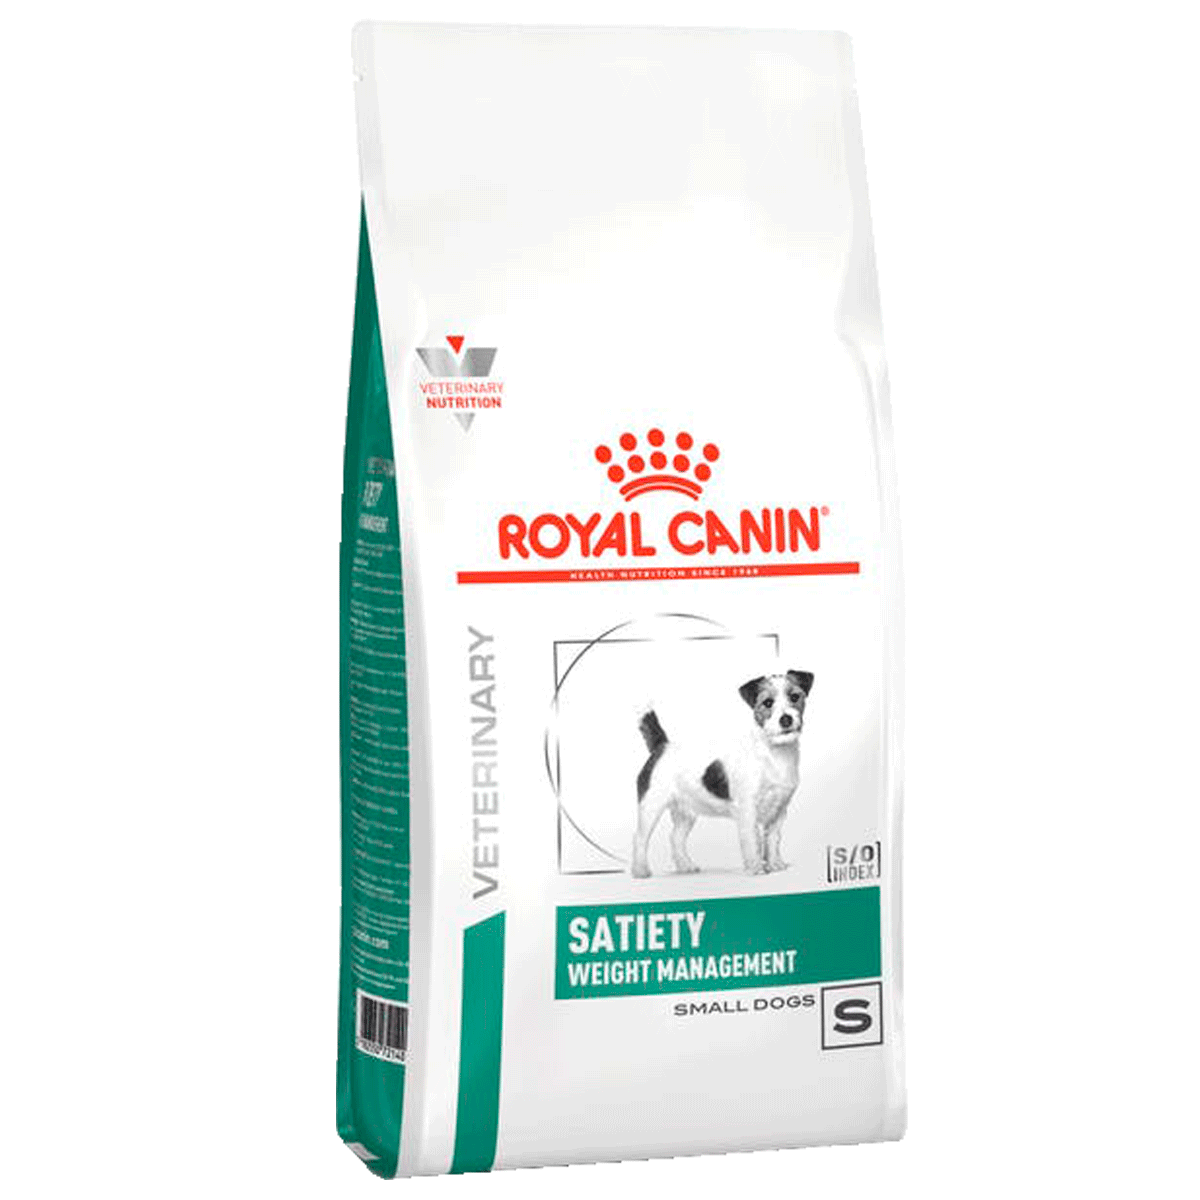 ROYAL CANIN CANINE SATIETY SMALL DOG